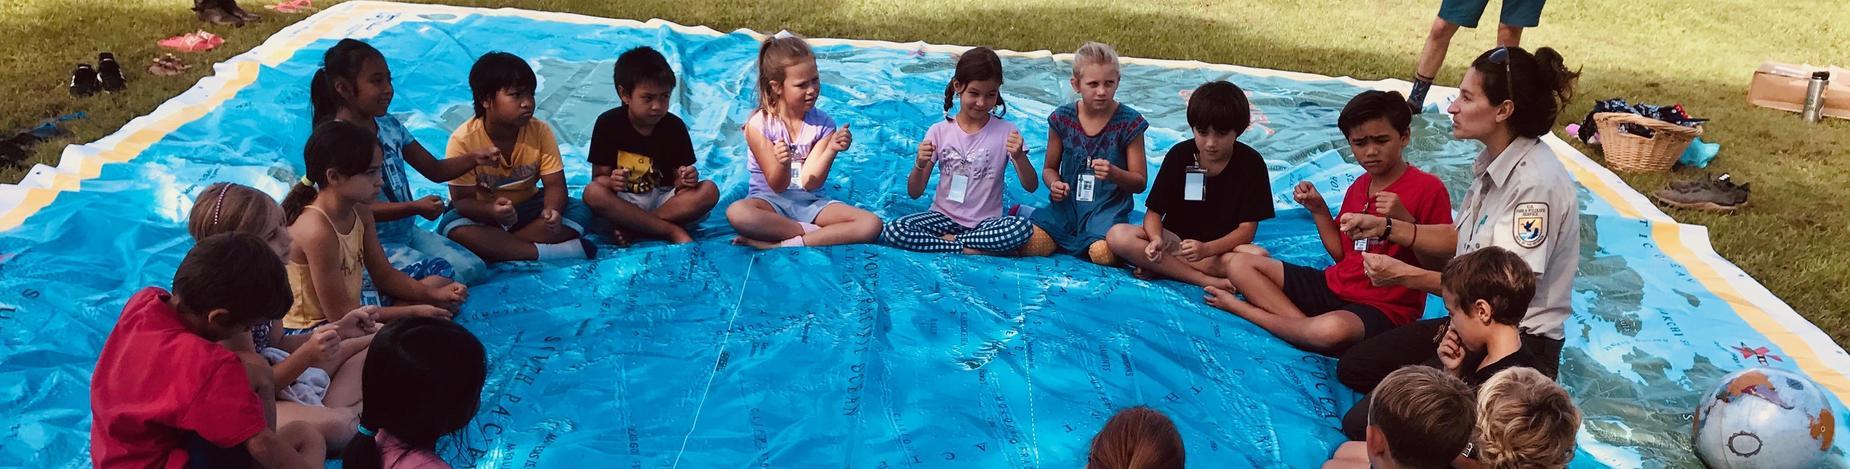 Kilauea Lighthouse Ranger teaches children about bird migration.